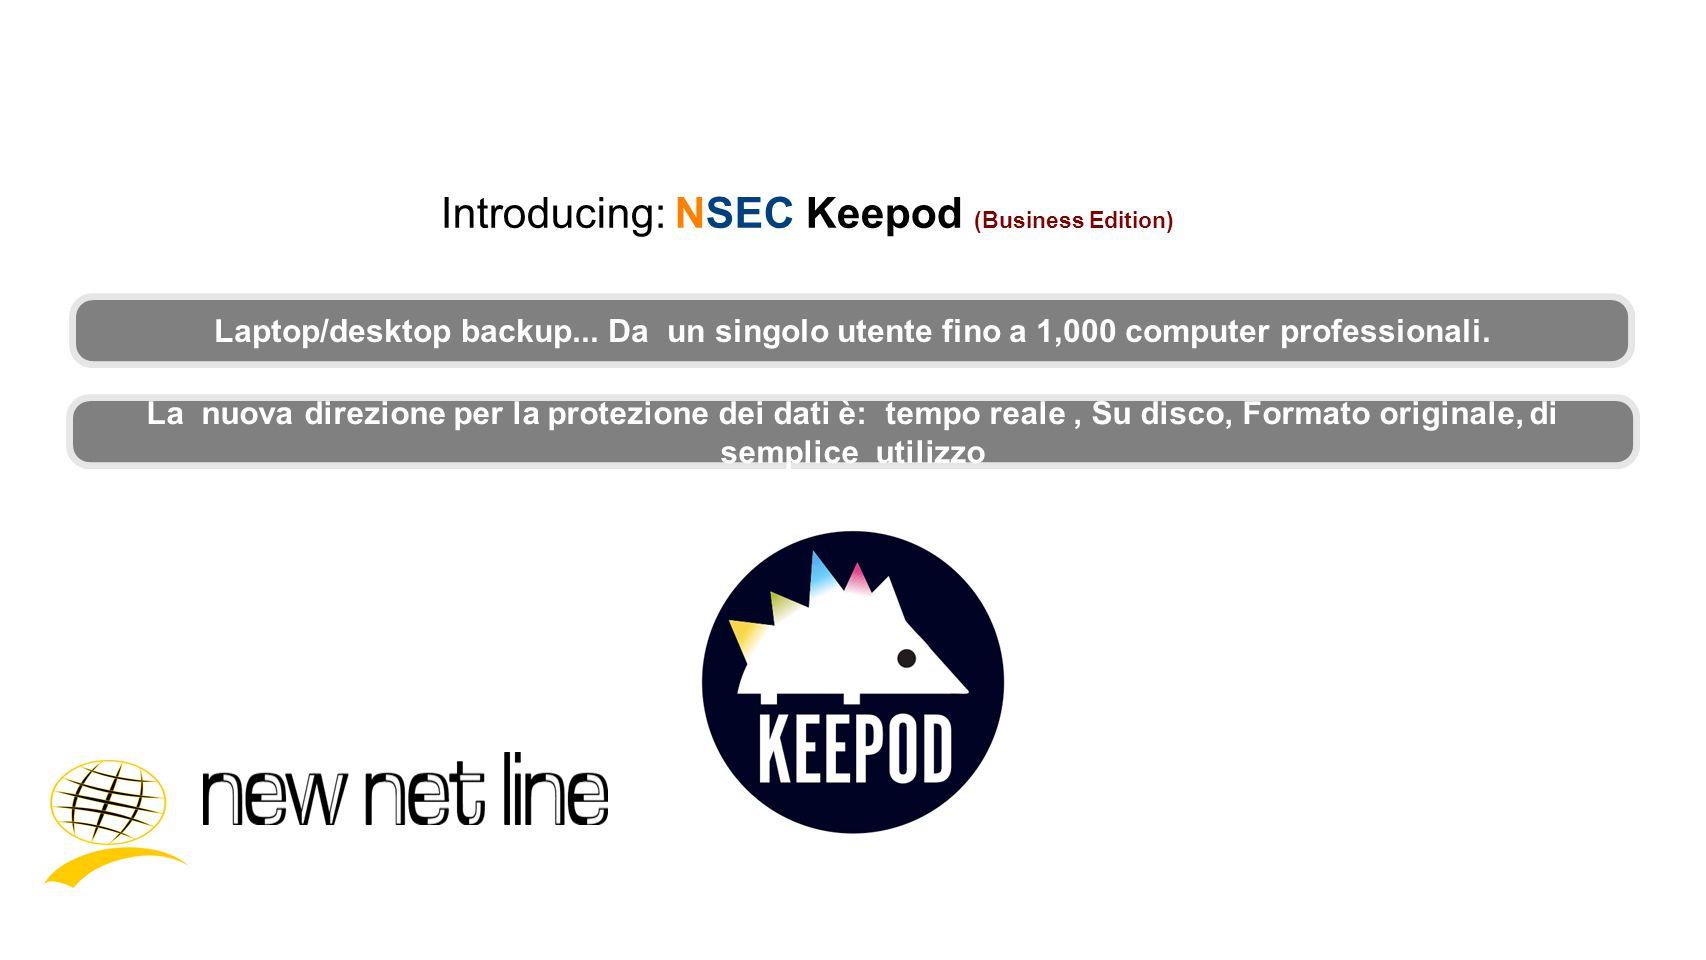 Cosè Keepod.